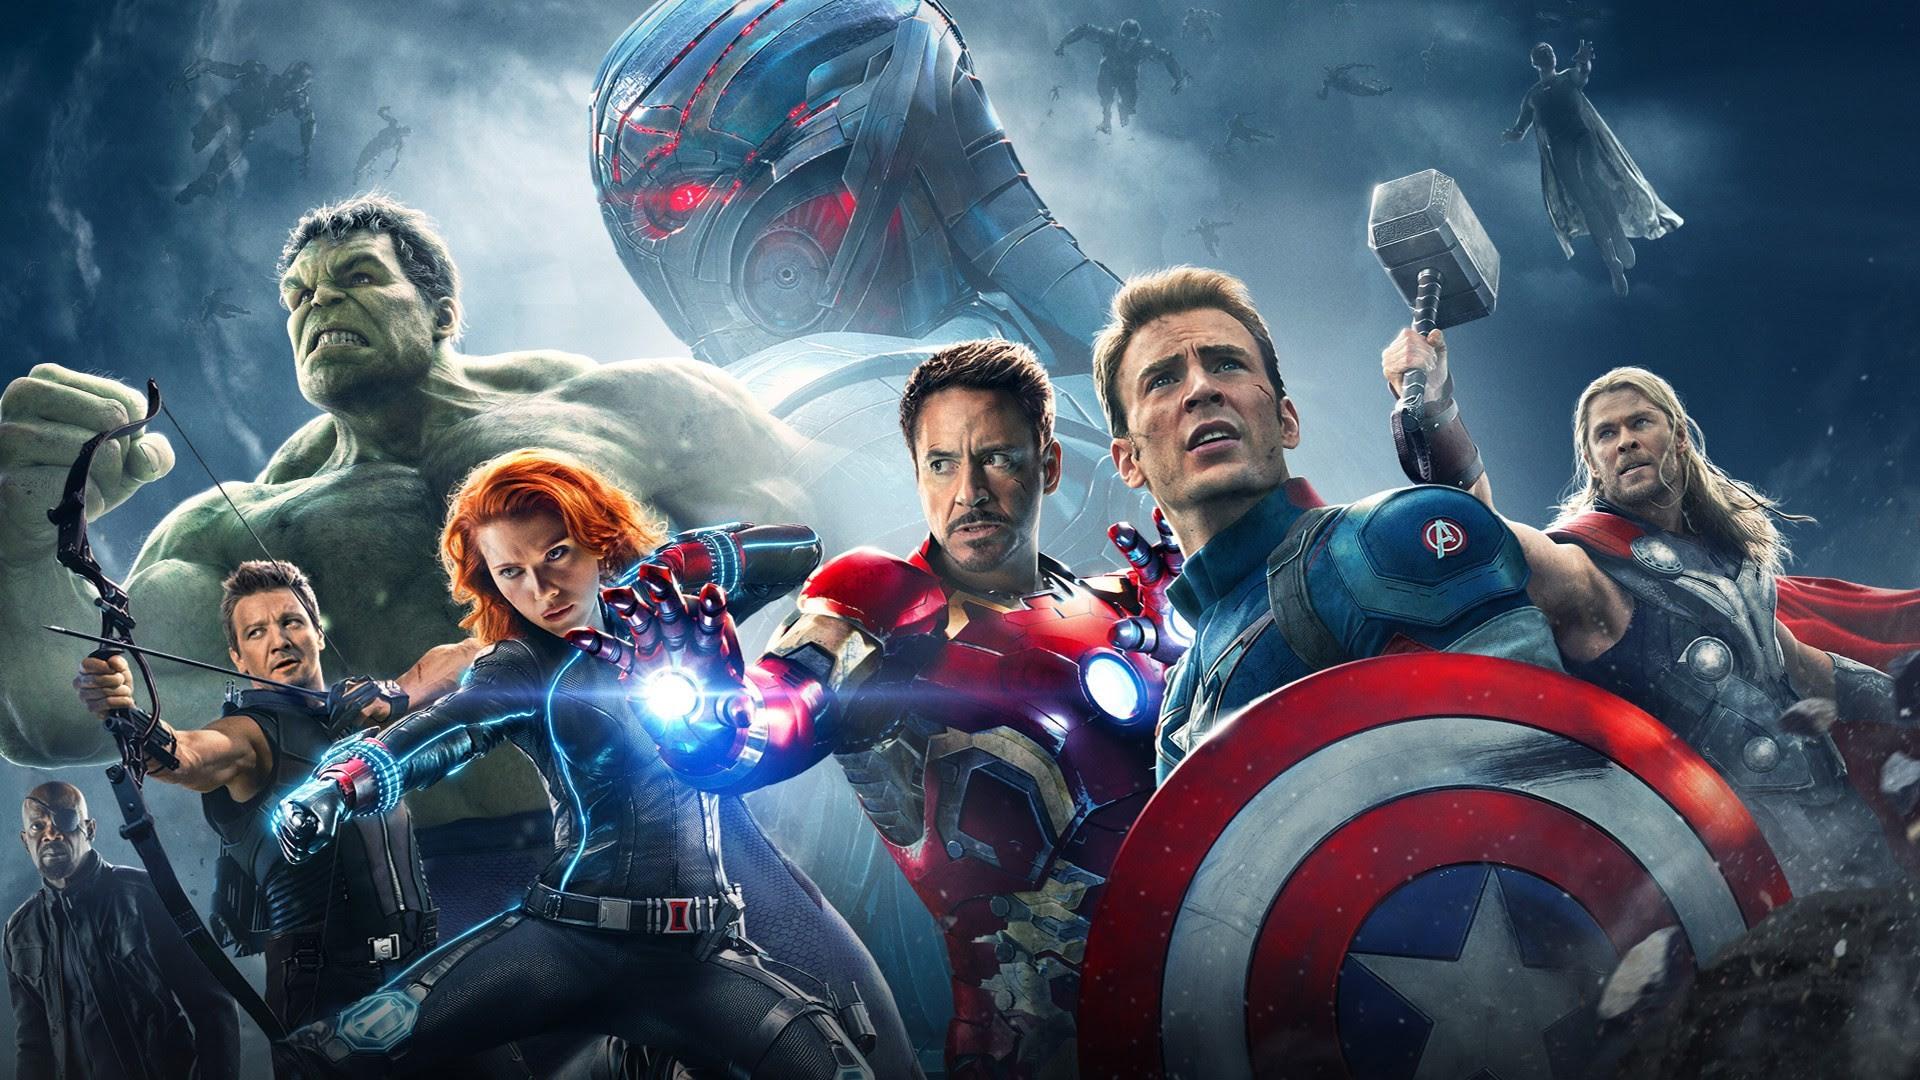 Download avenger infinity war hd bluray  Free Download Film Terbaru Avengers